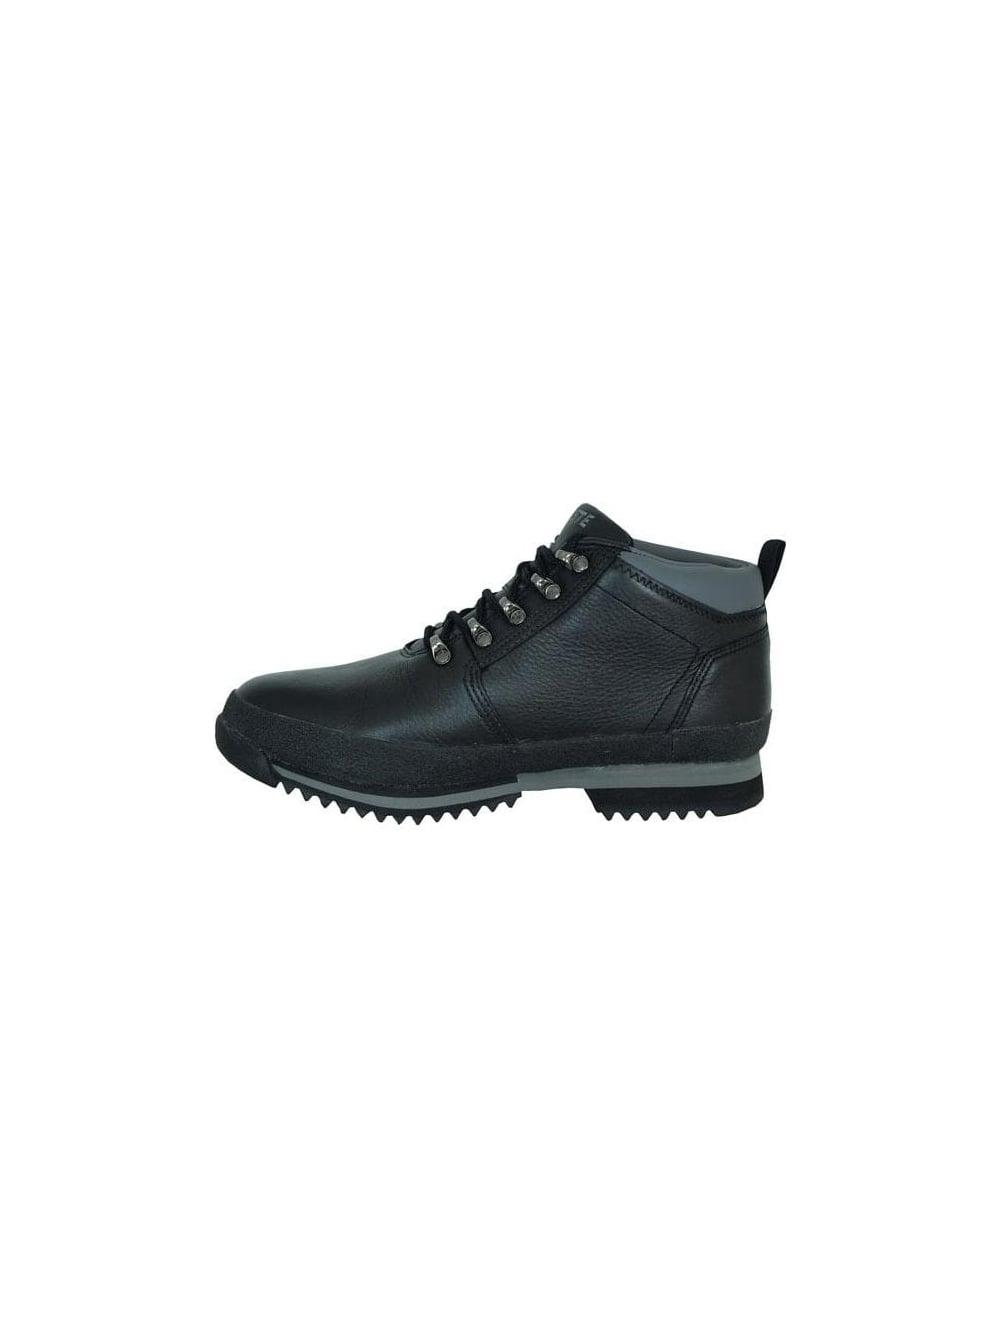 15857bb9621d5 Lacoste Footwear - Lacoste Upton Leather Spm Mid Boot - Black Grey ...